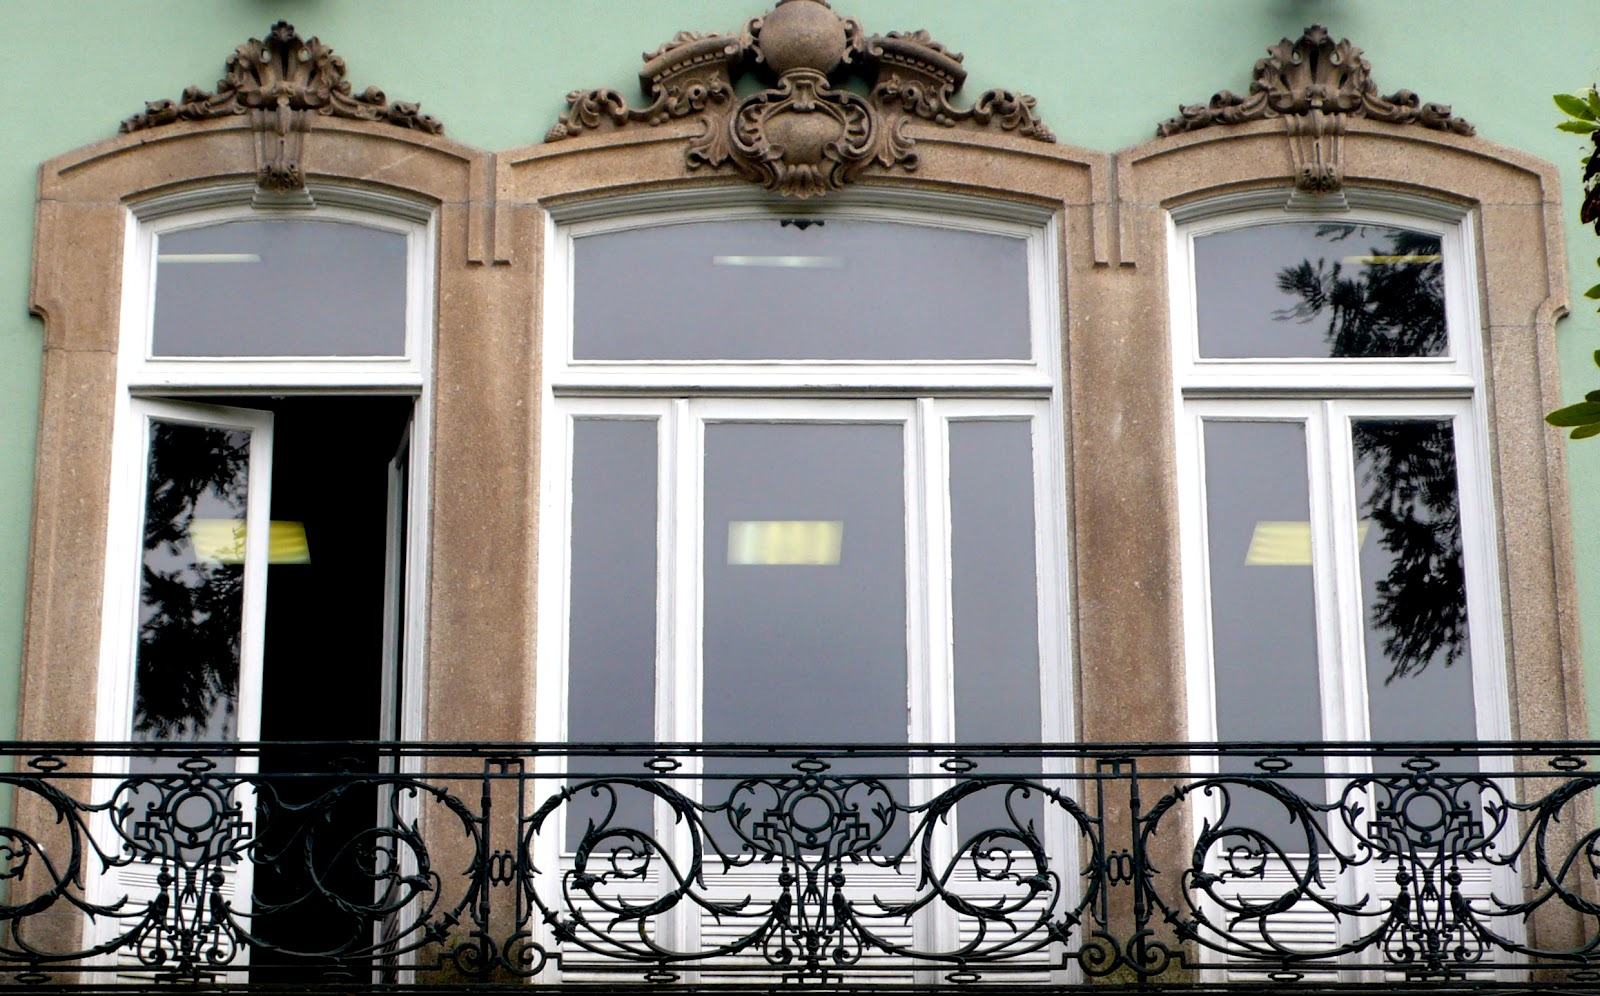 #7E634D  vidro duplo encaixe de alunínio pintado sem graça originalidade 62 Janelas De Vidro Duplo Porto Alegre